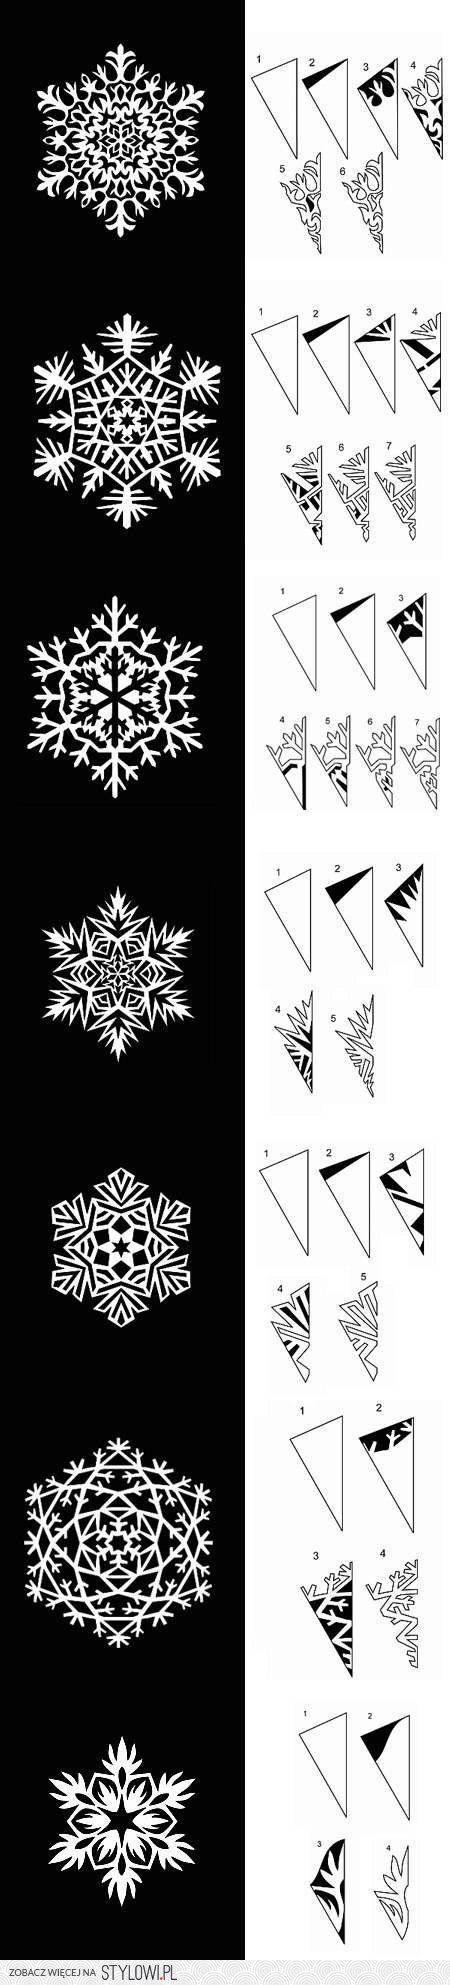 DIY Paper Snowflakes Templates DIY Projects | UsefulDIY… na Stylowi.pl